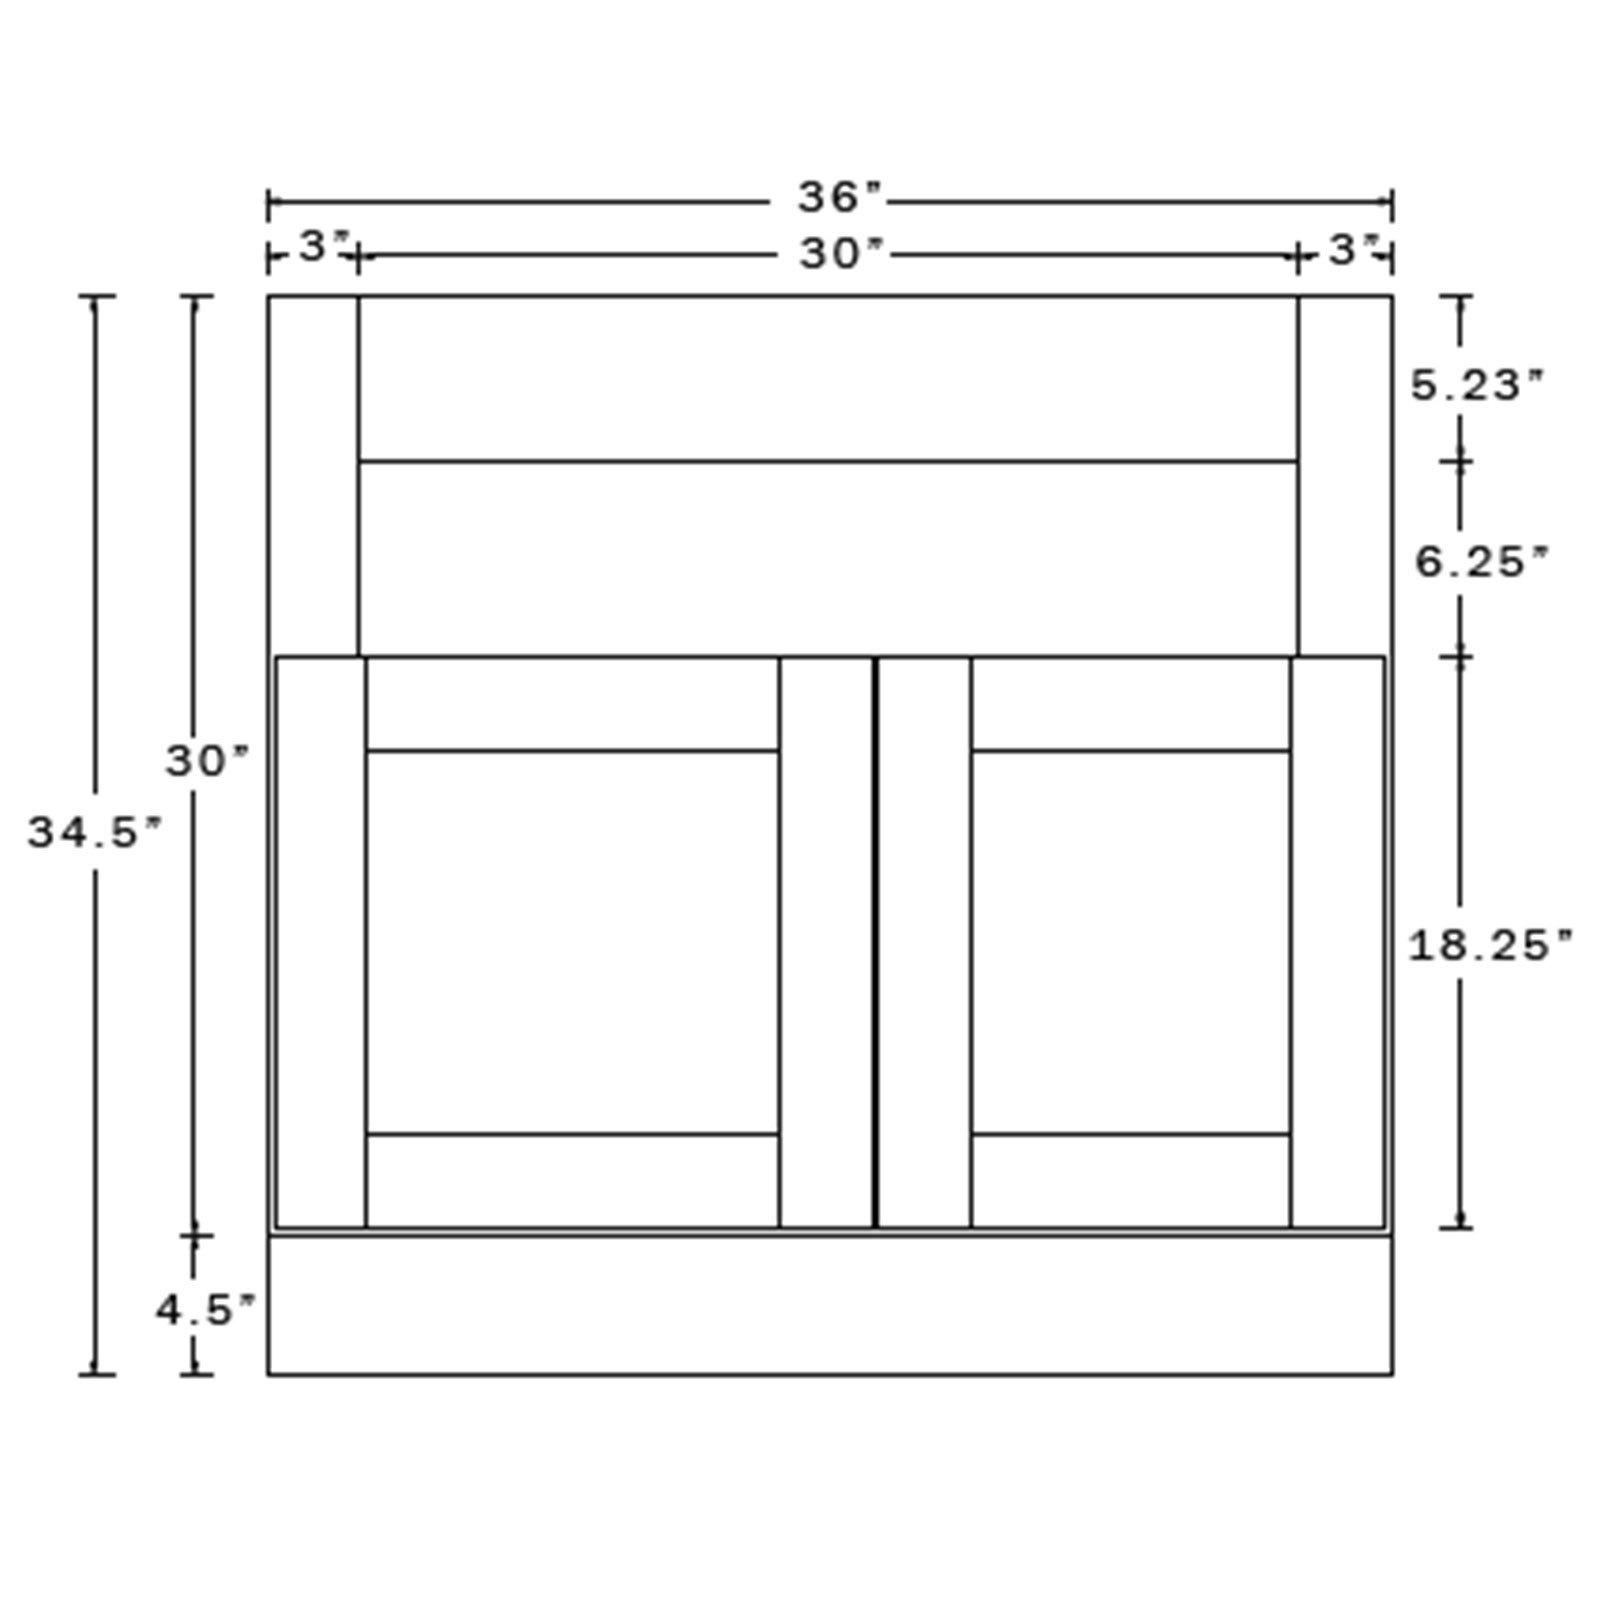 Everyday Cabinets 36 Inch Dark Espresso Shaker Farmhouse Apron Sink Base Kitchen Cabinet